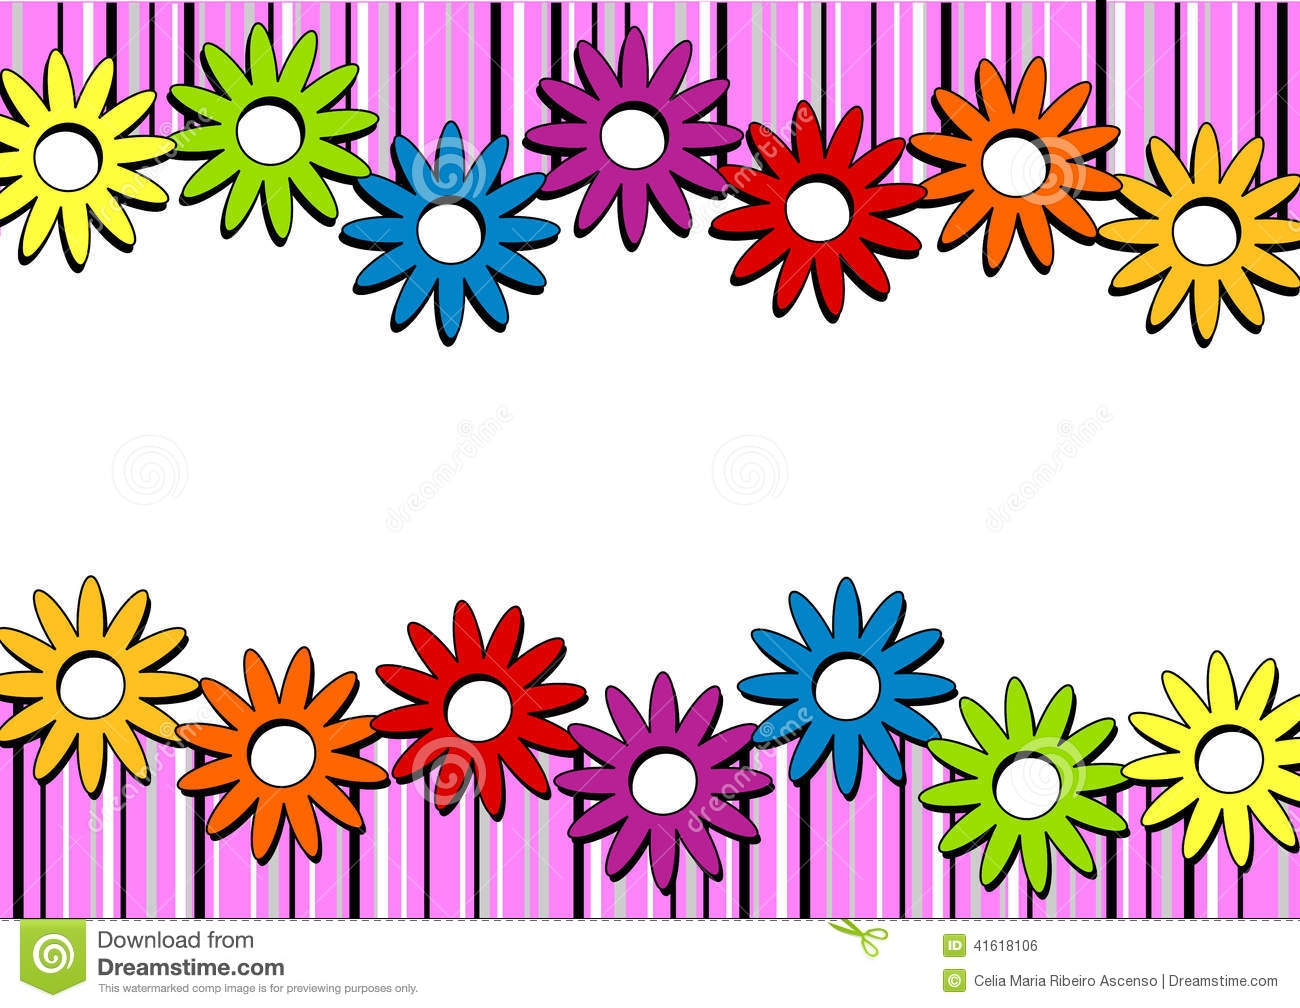 April clipart border design. Flower cilpart crafty ideas